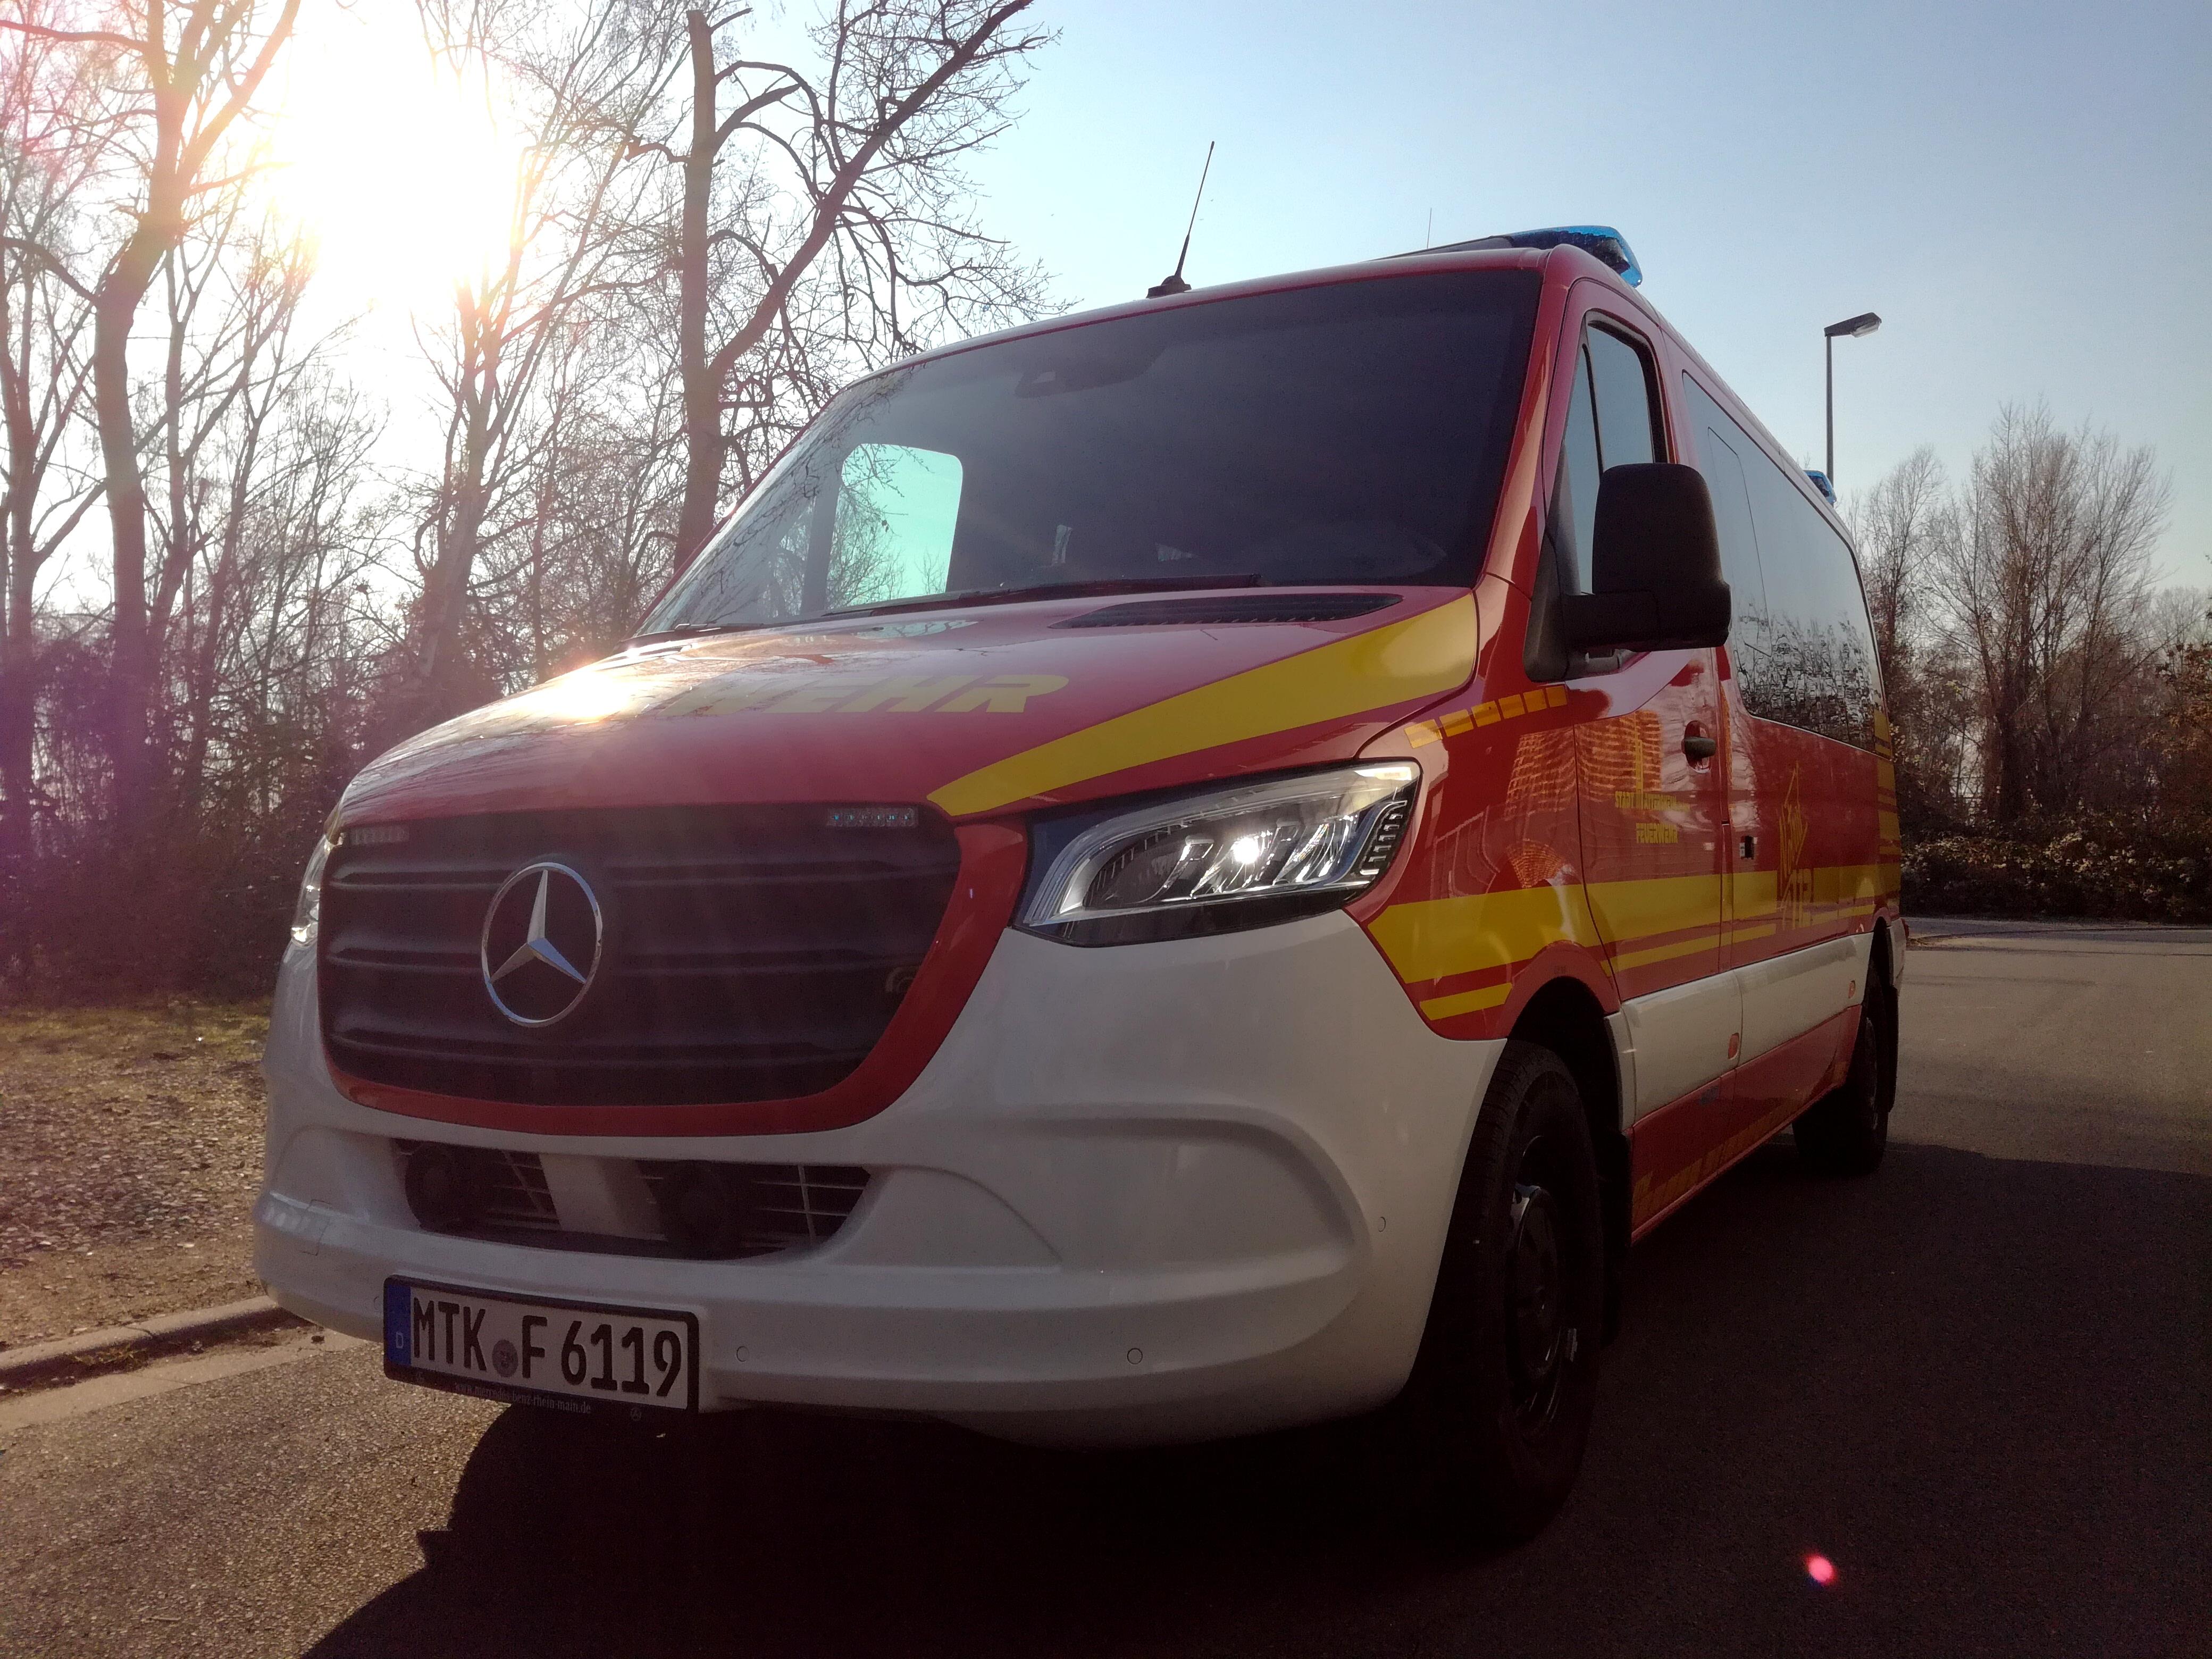 Mannschaftstransportfahrzeug (MTF)